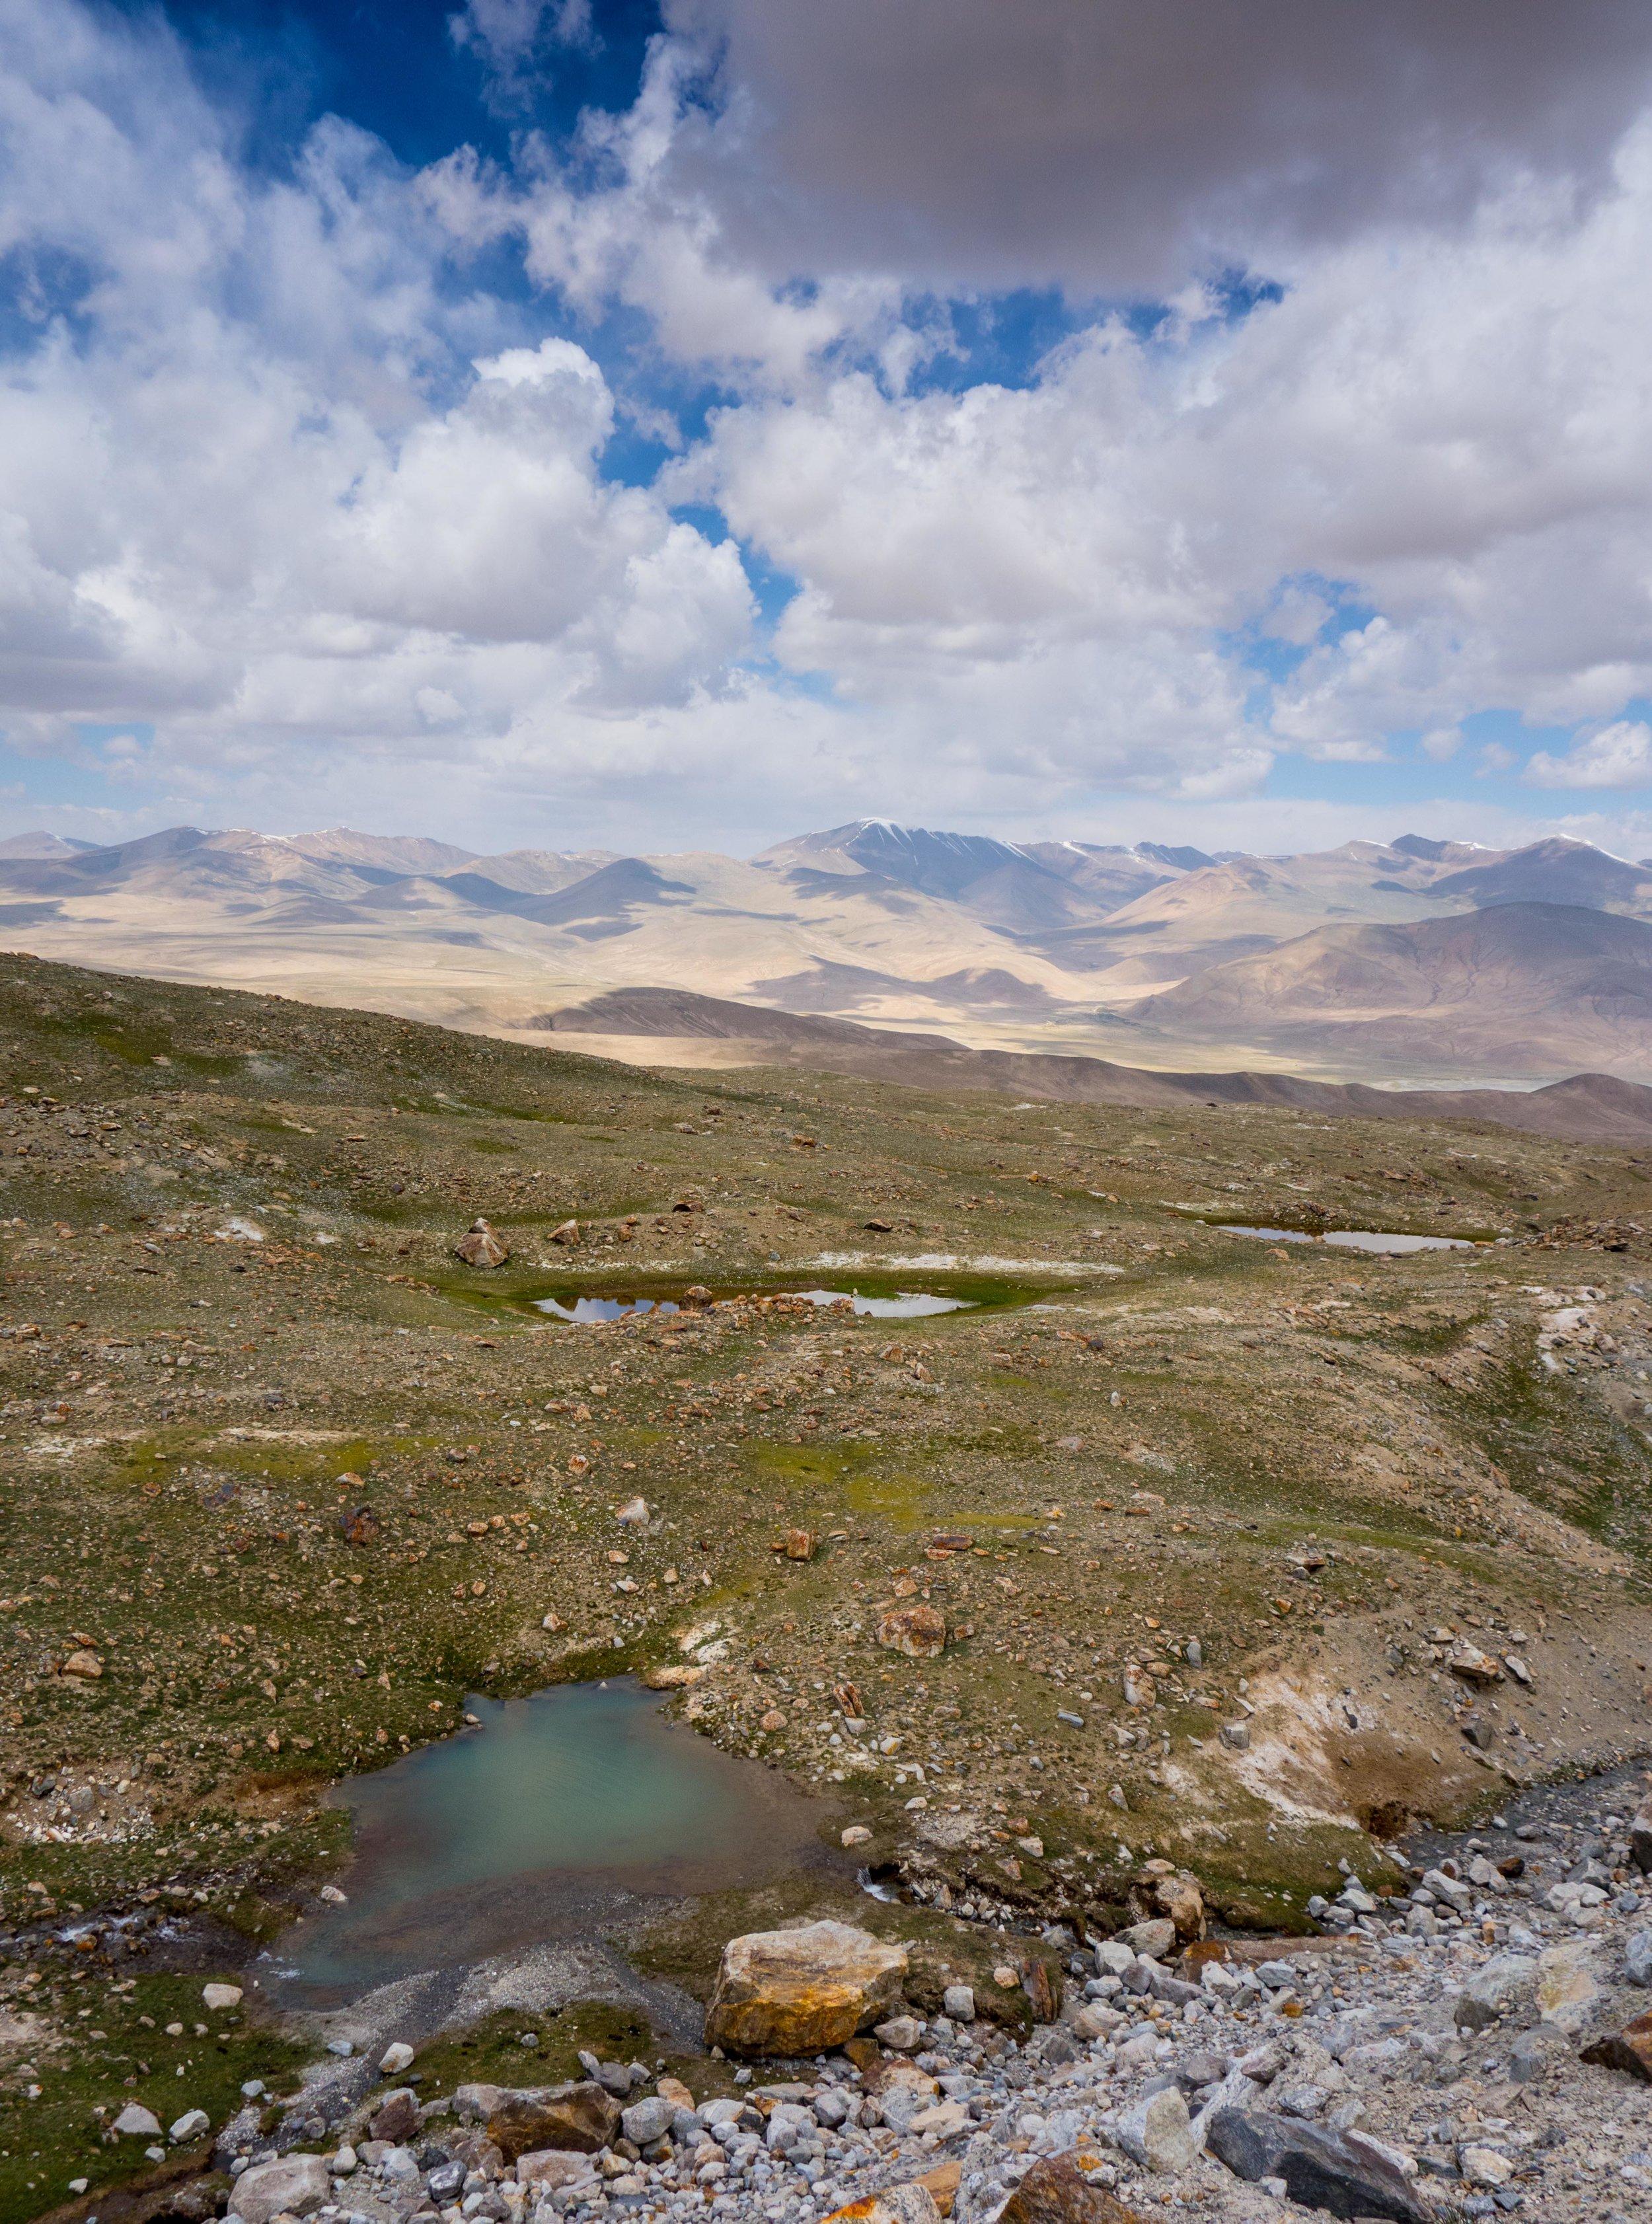 Near Mustagh Ata base camp, Karakoram Highway, Western China